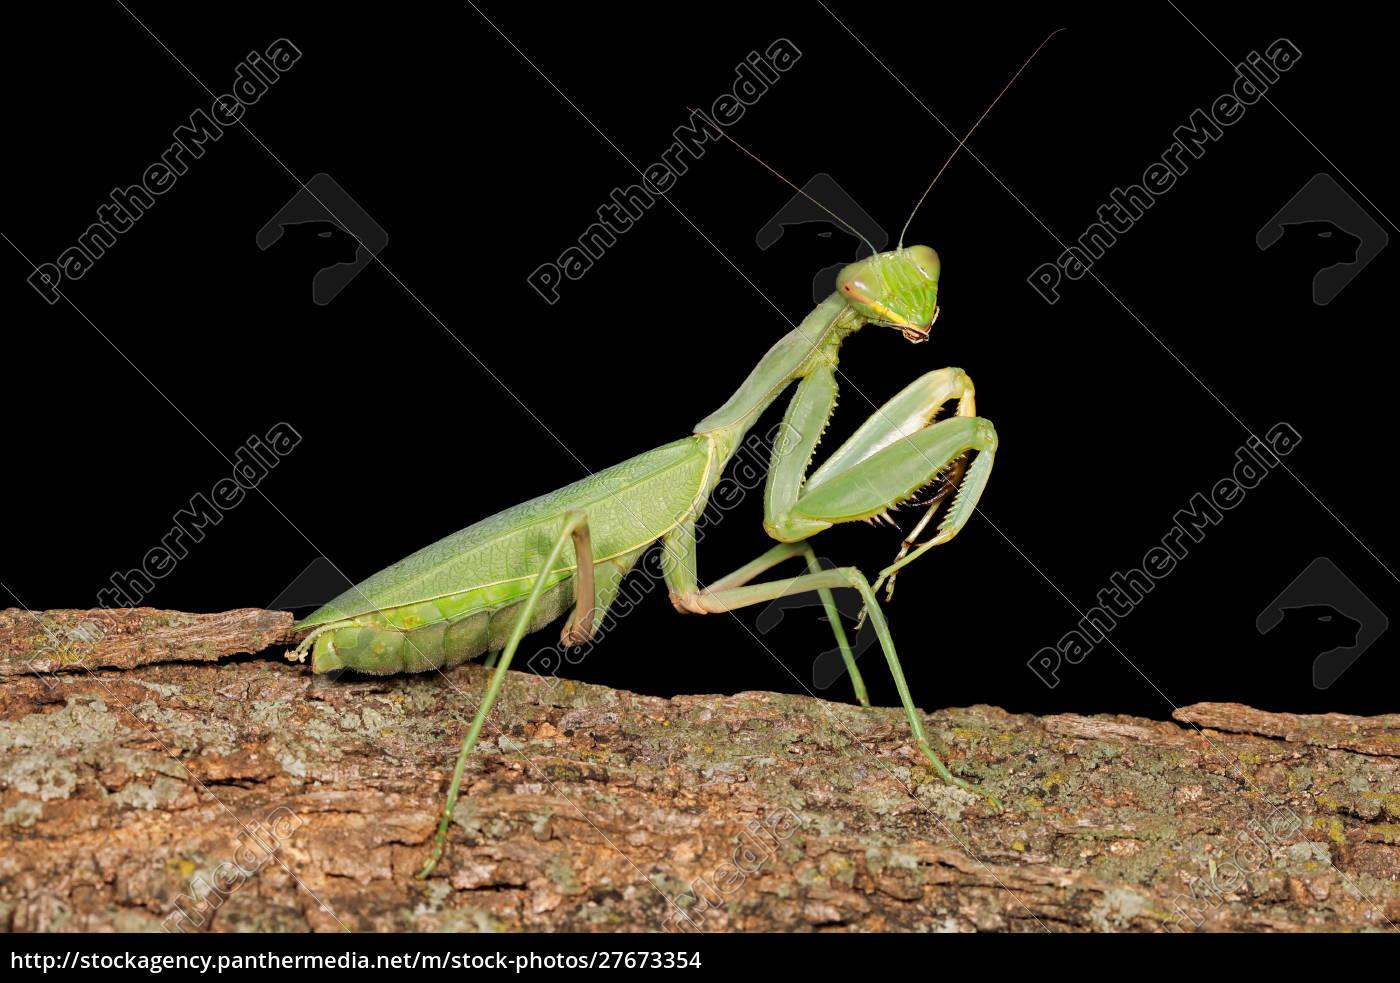 common, green, mantis - 27673354